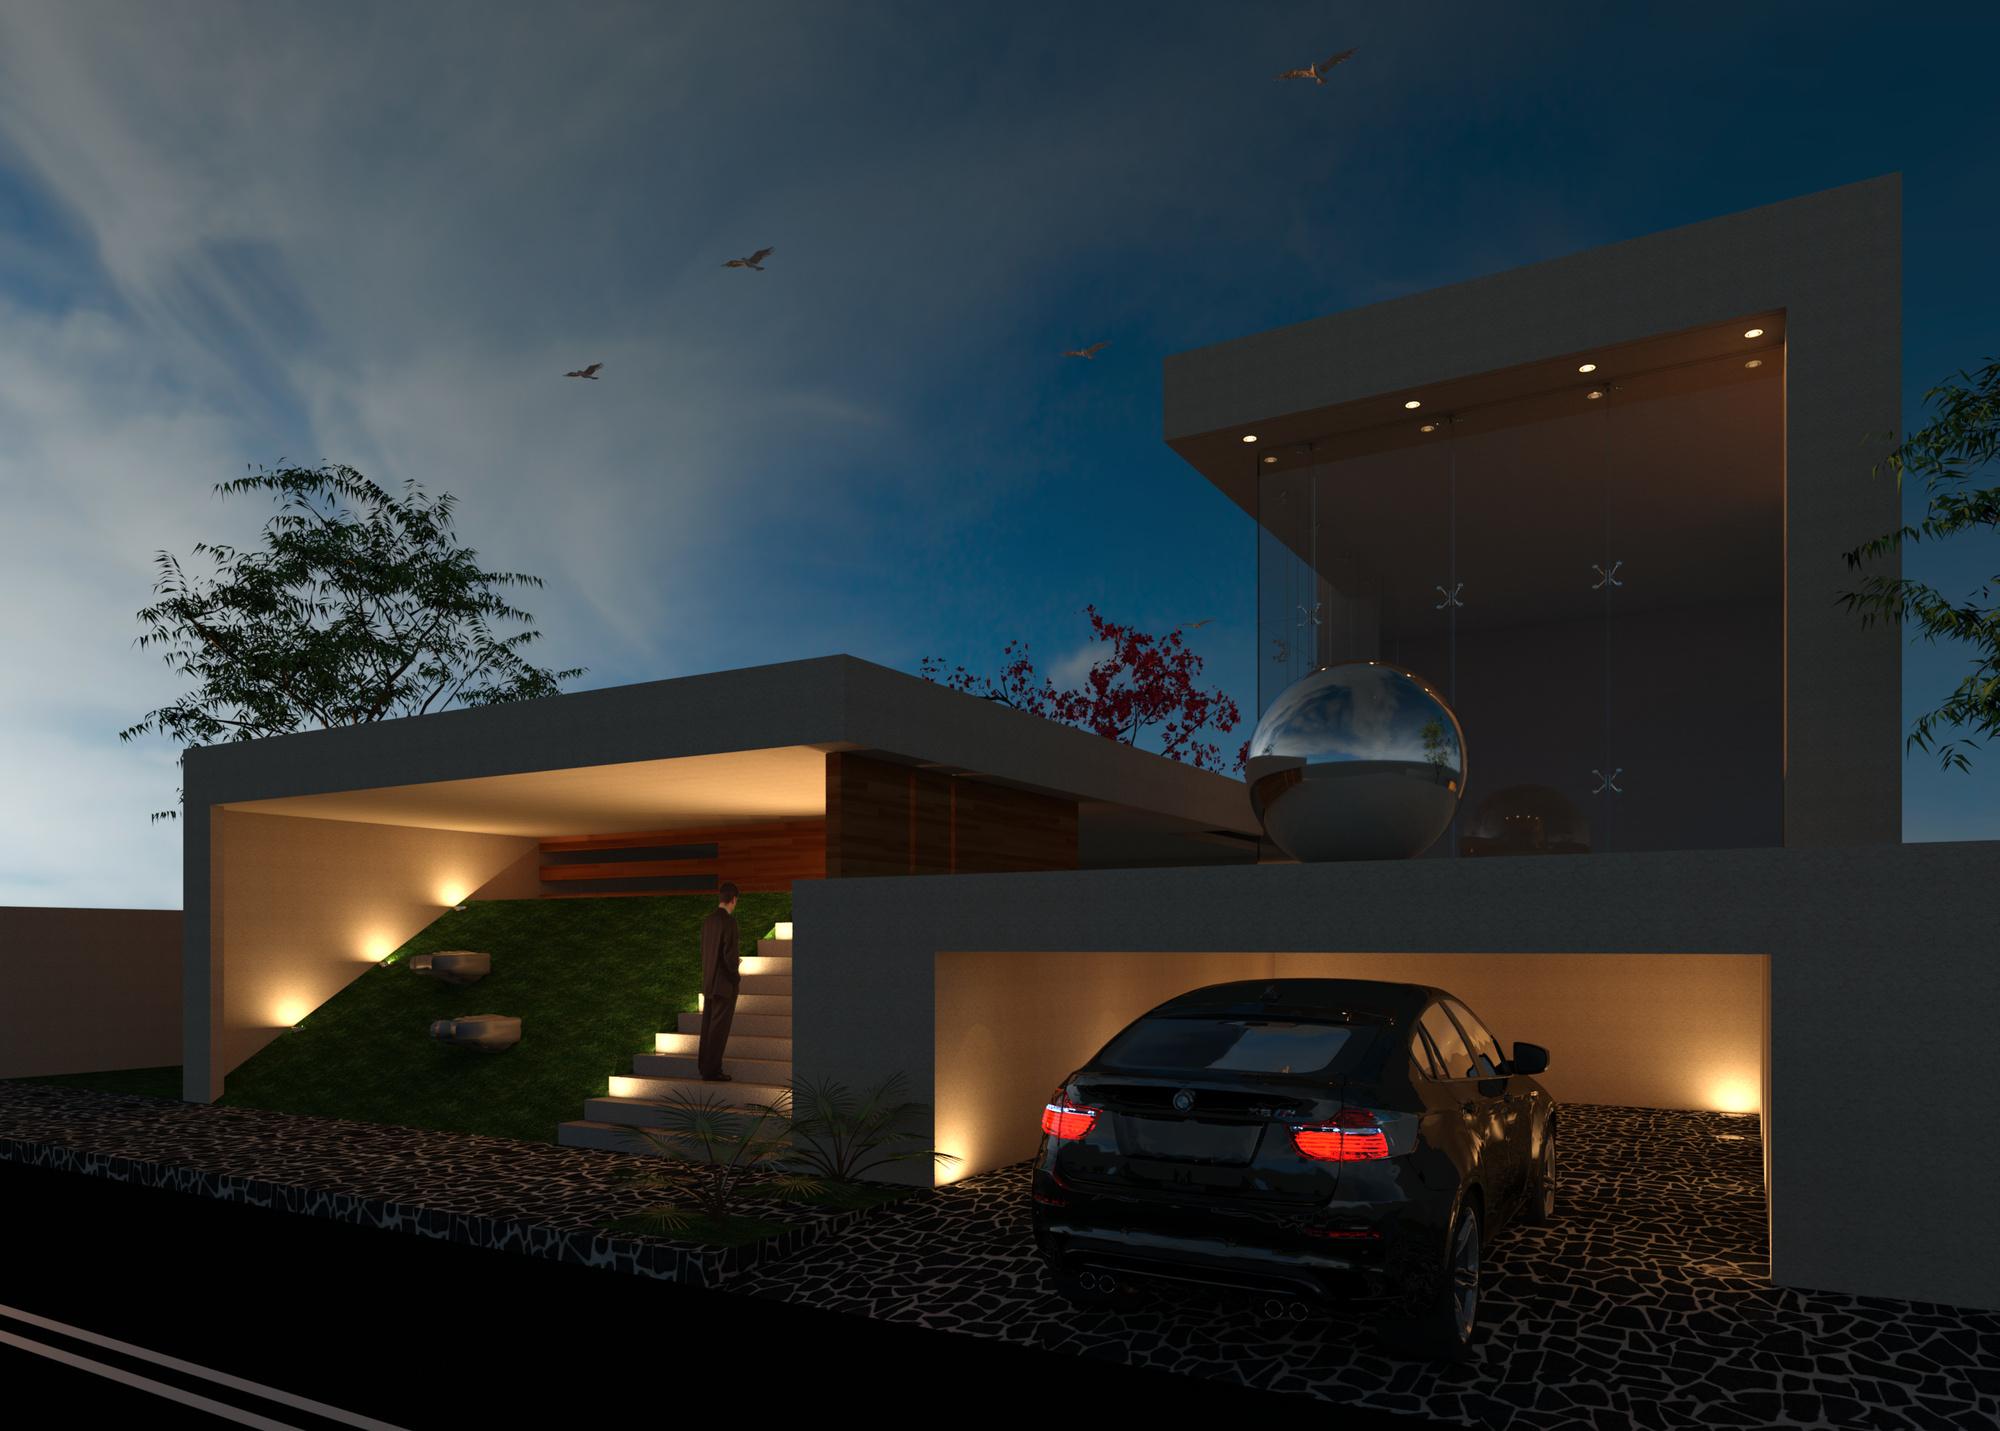 Raas-rendering20150320-9802-1e3xfi1